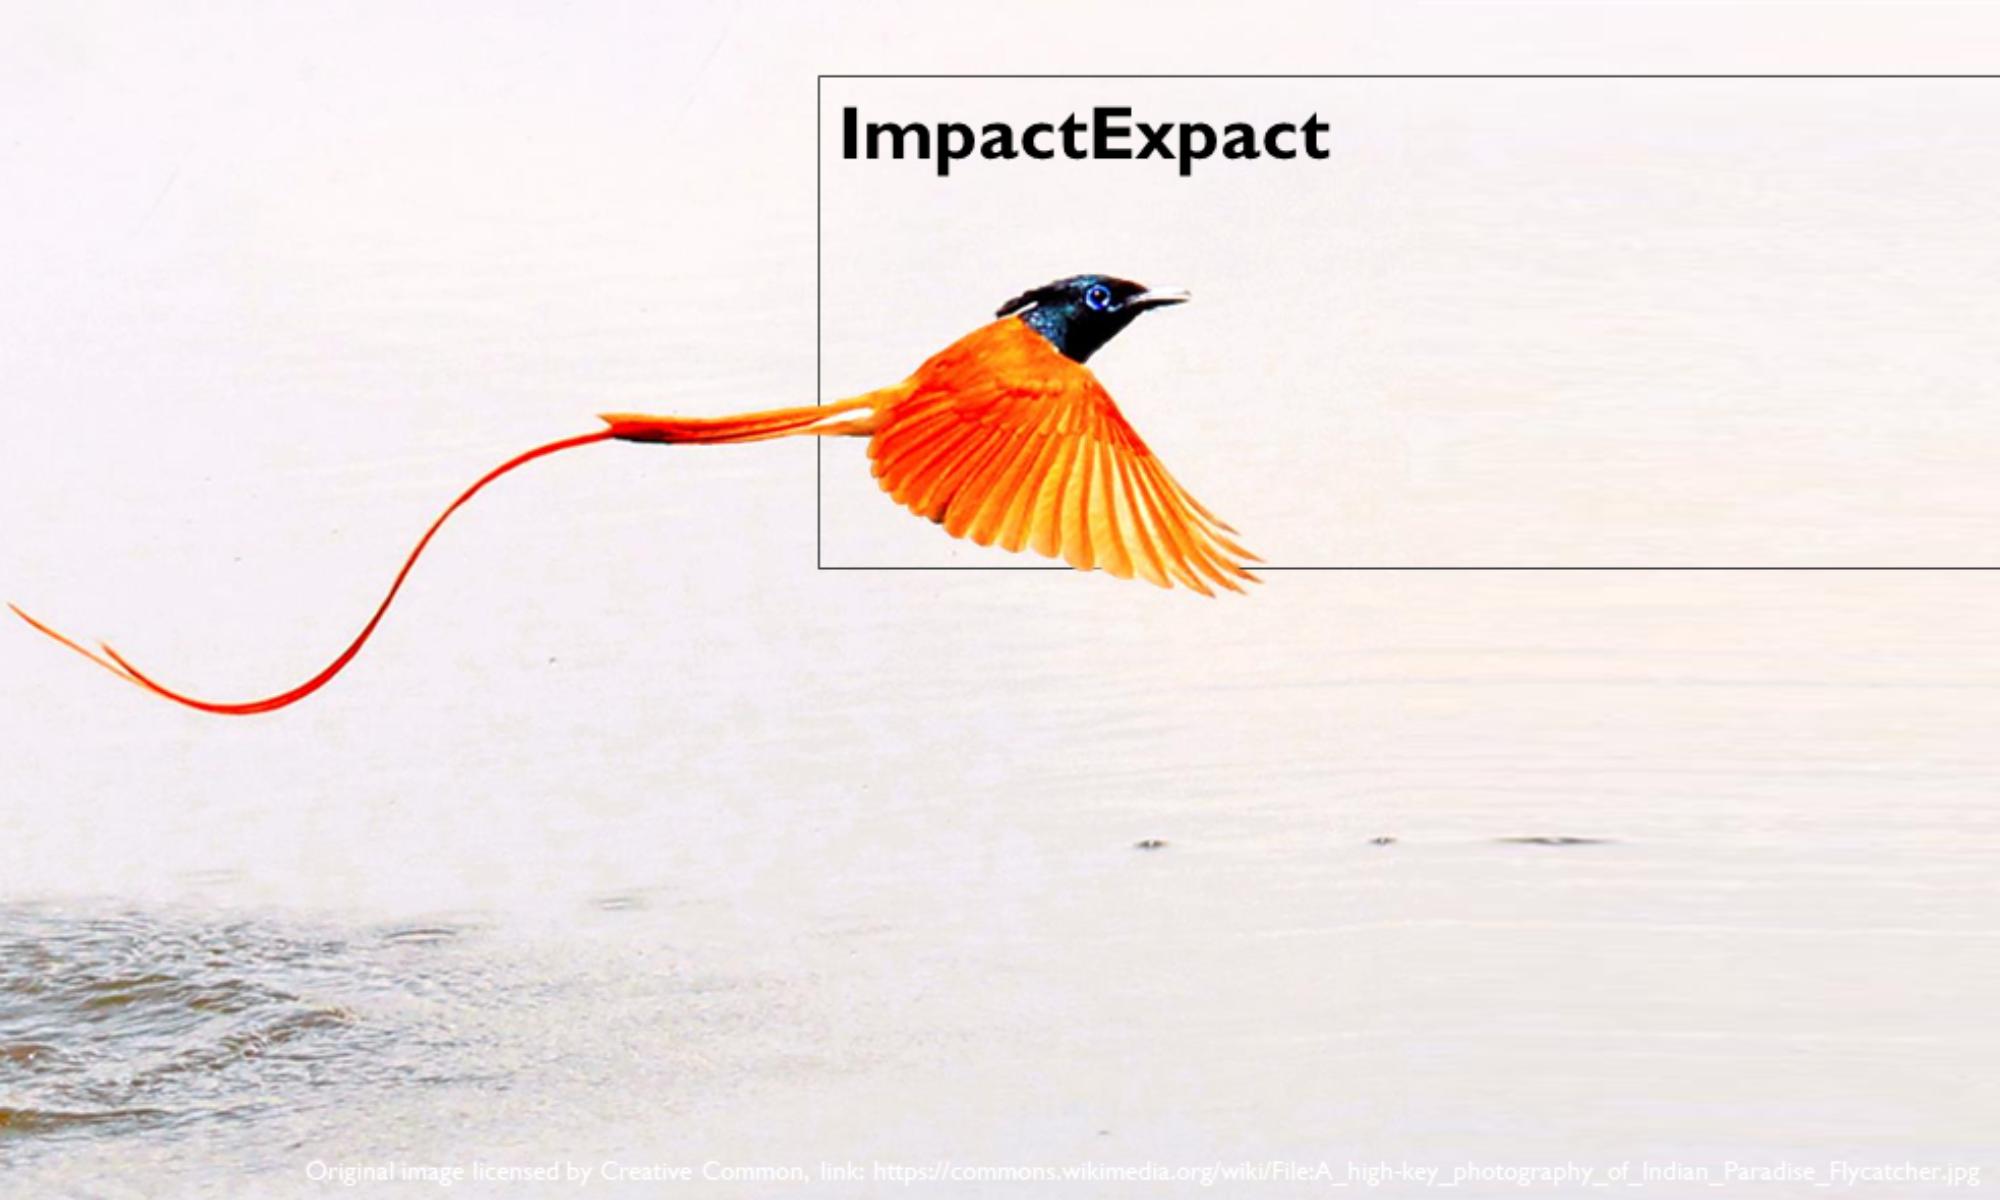 ImpactExpact